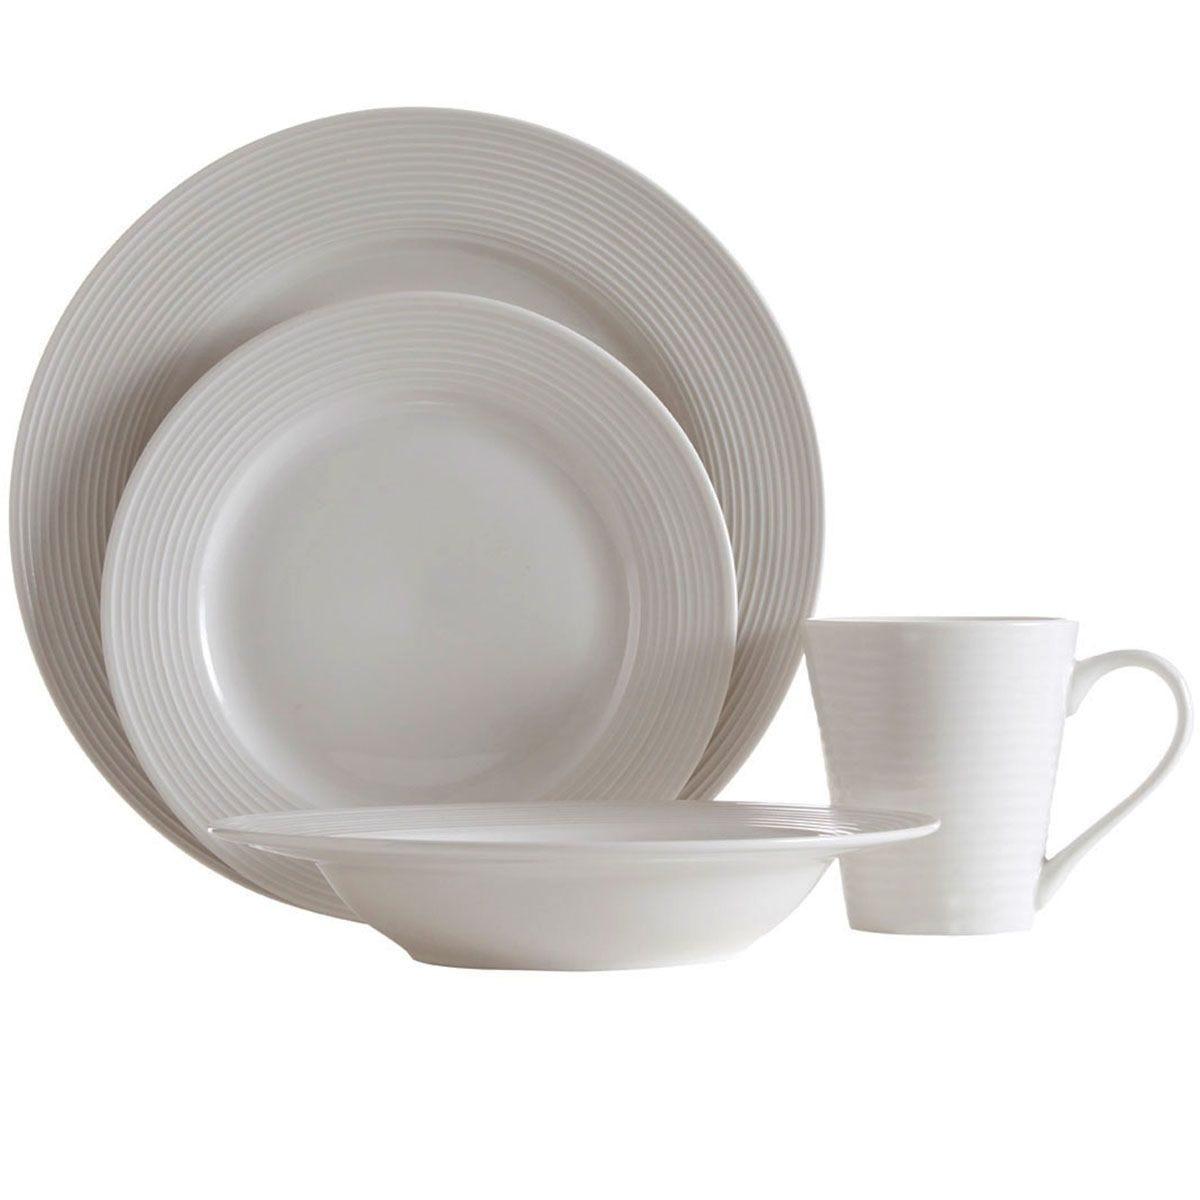 Premier Housewares 16-Piece Ribbed Dinner Set - White